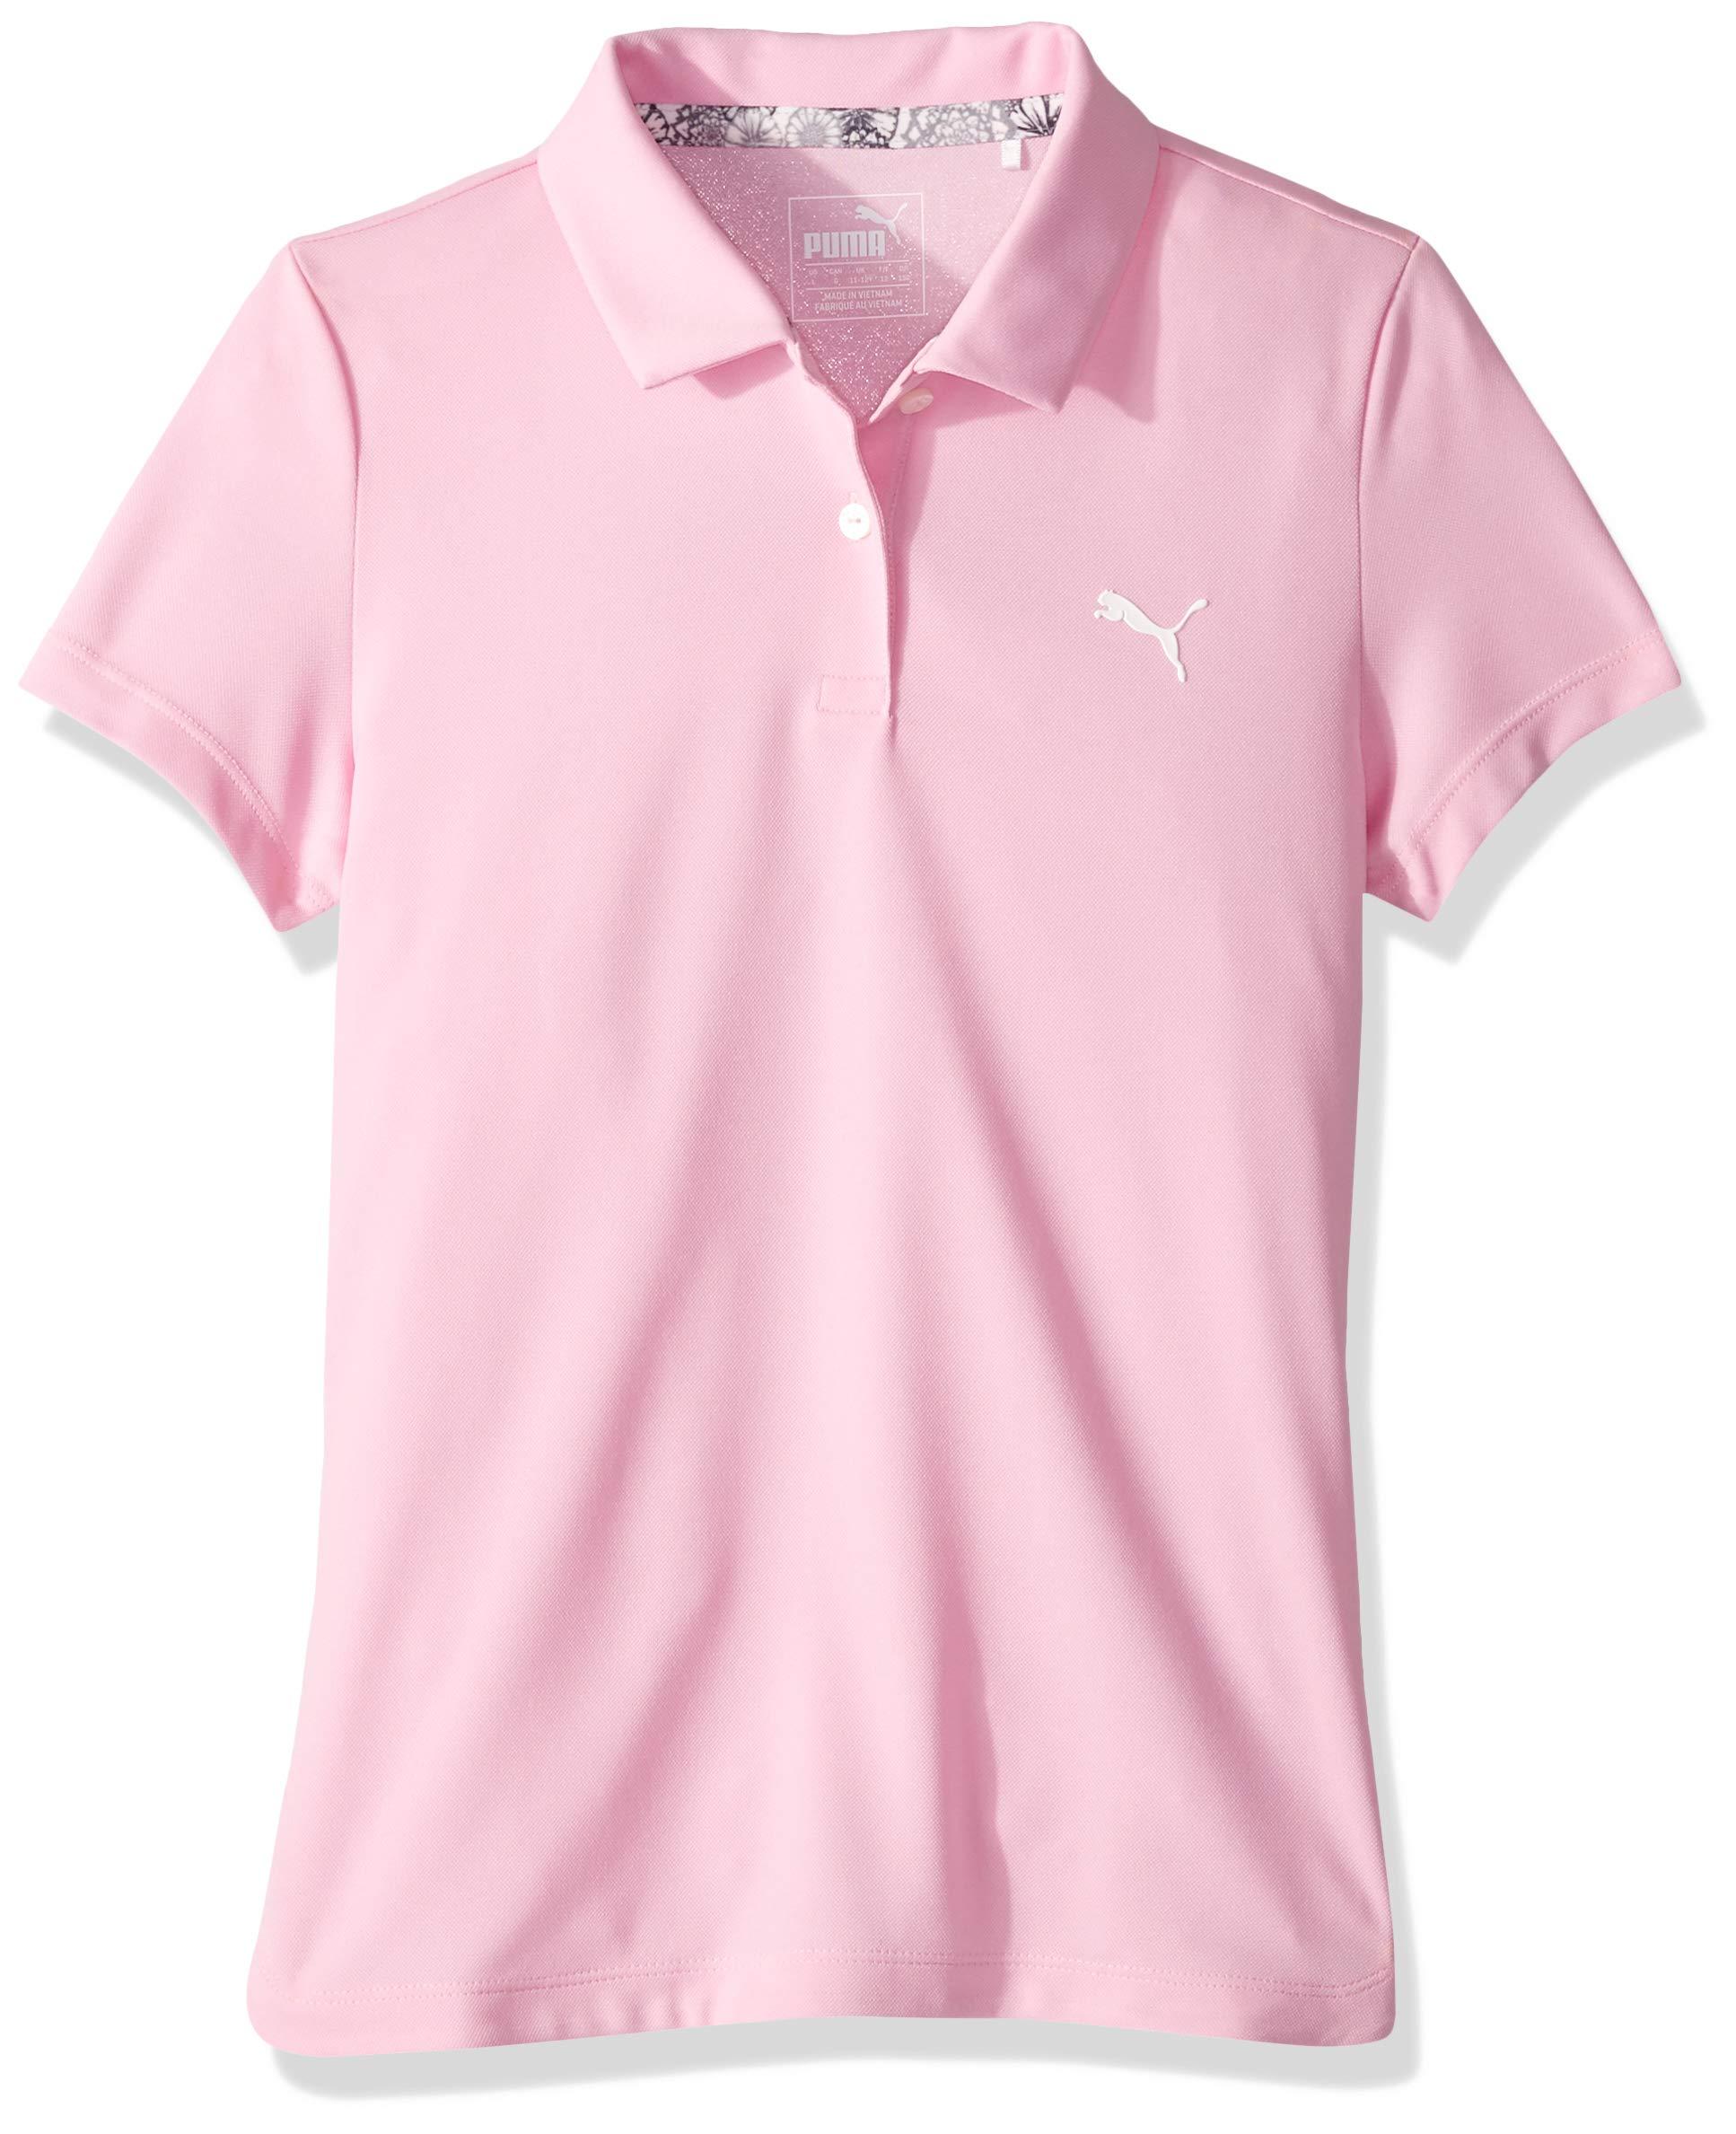 Puma Golf Girls 2019 Polo, Pale Pink, x Small by PUMA